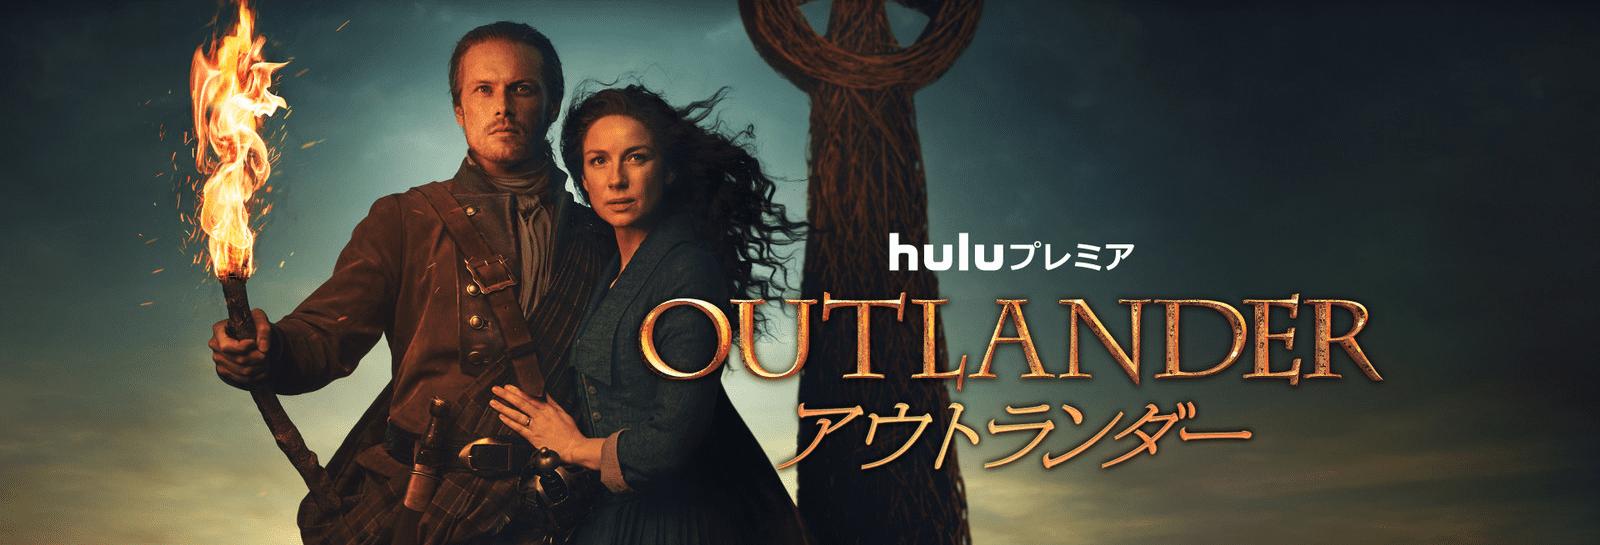 【Huluおすすめ海外ドラマ】Hulu(フールー)のおすすめ海外ドラマ作品一覧|ウォーキングデッド・ゲームオブスローンズ・Huluプレミア作品など充実!|Huluプレミア編:アウトランダー シーズン5